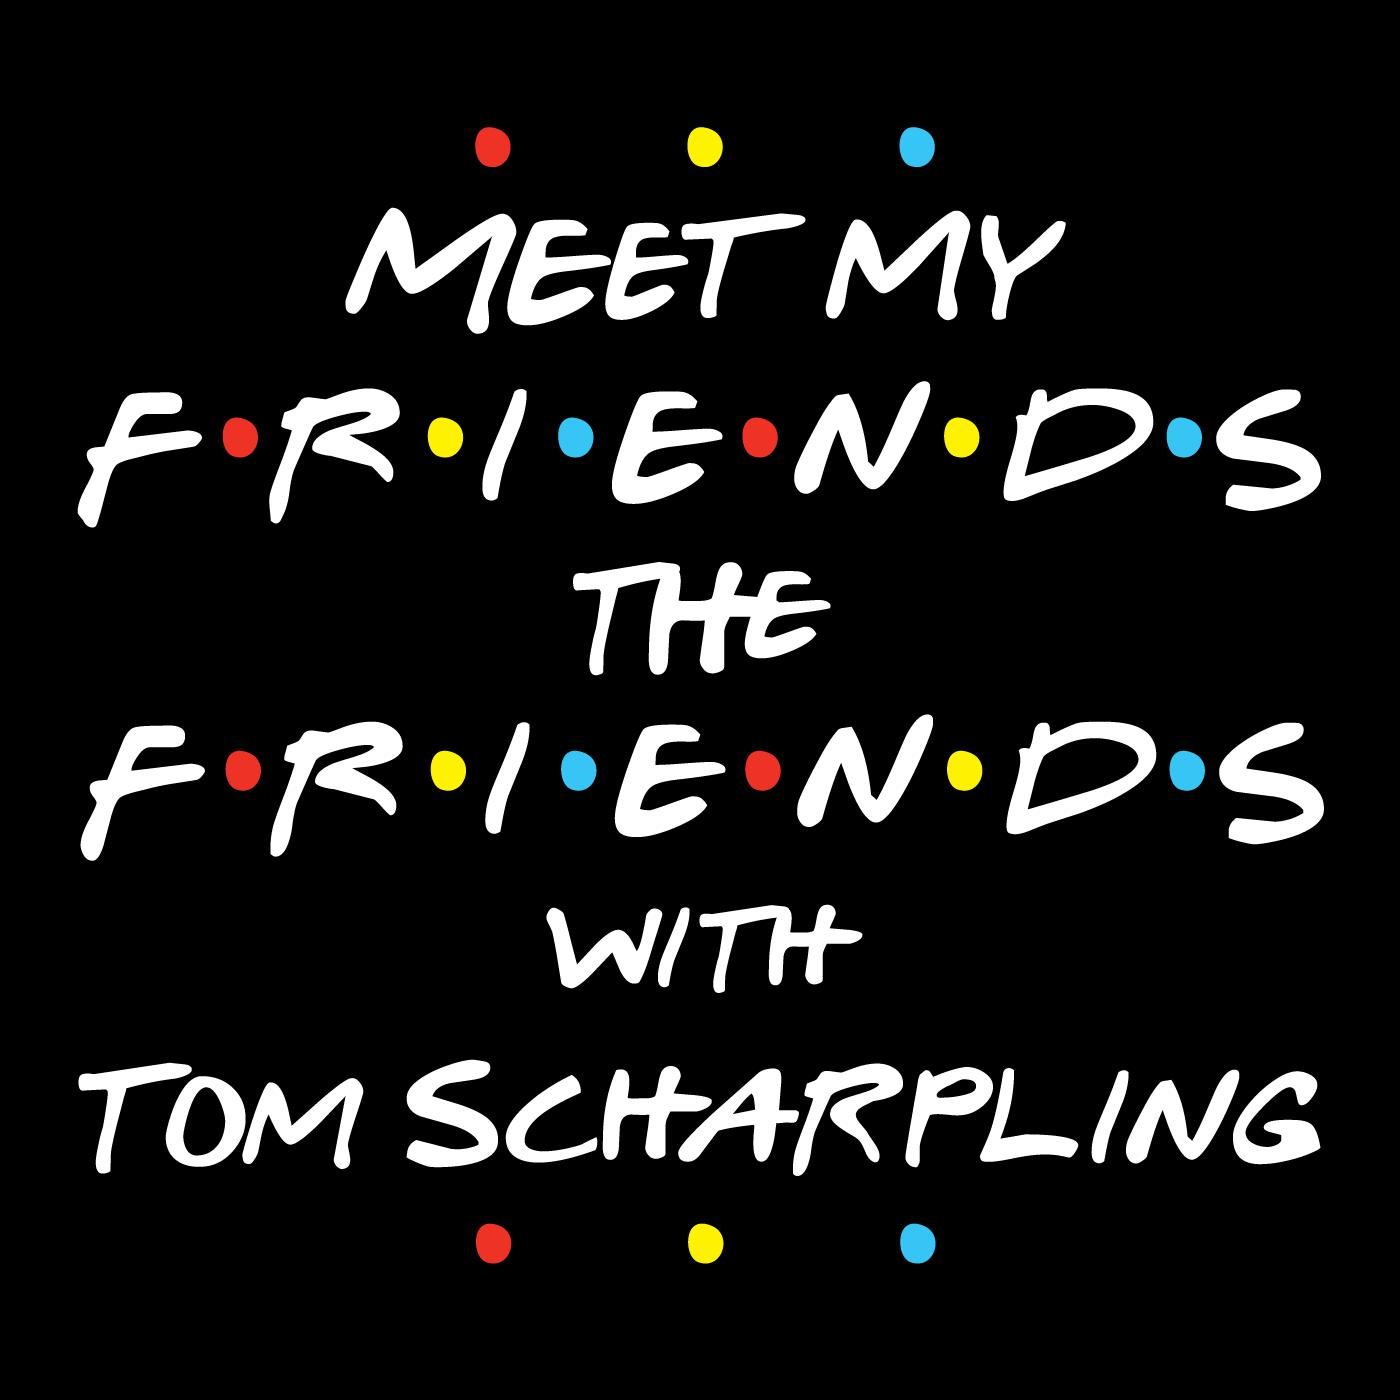 Meet My Friends The Friends with Tom Scharpling (podcast) - Tom